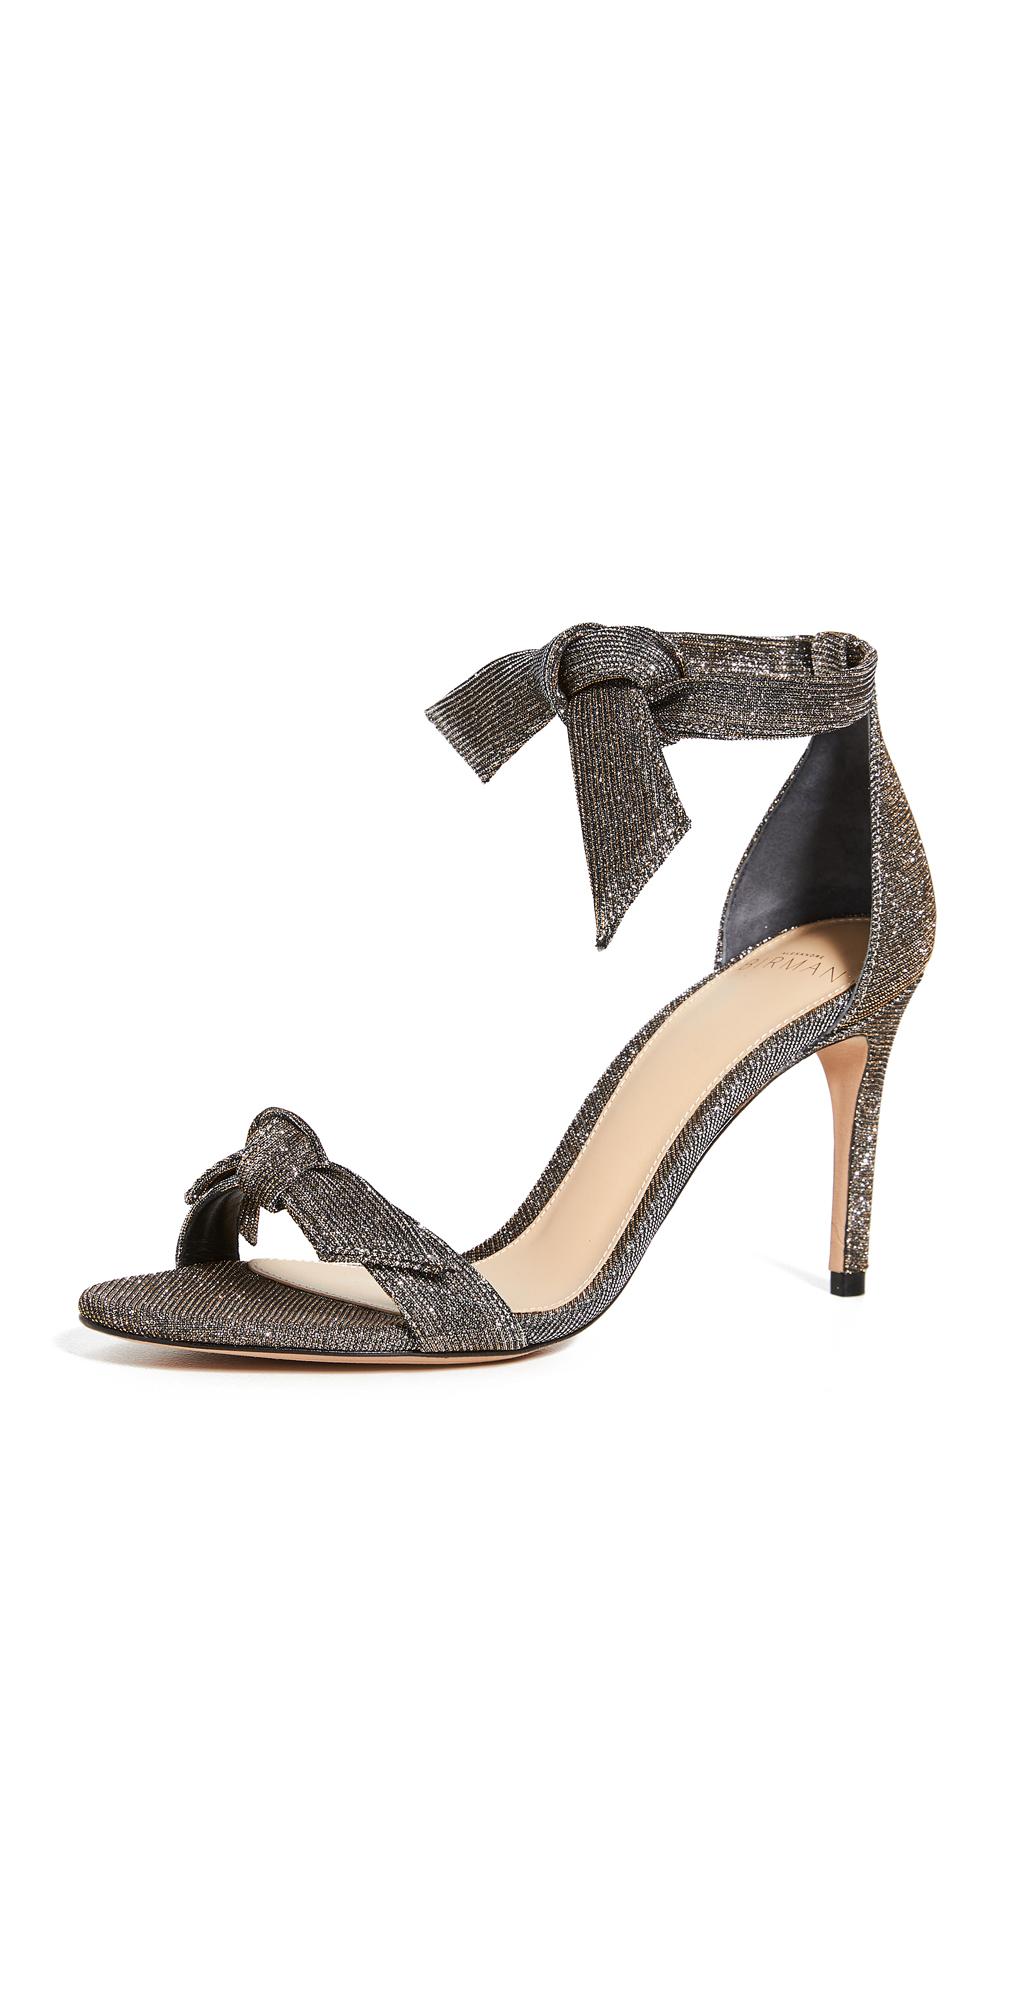 Alexandre Birman 85mm Clarita Sandals